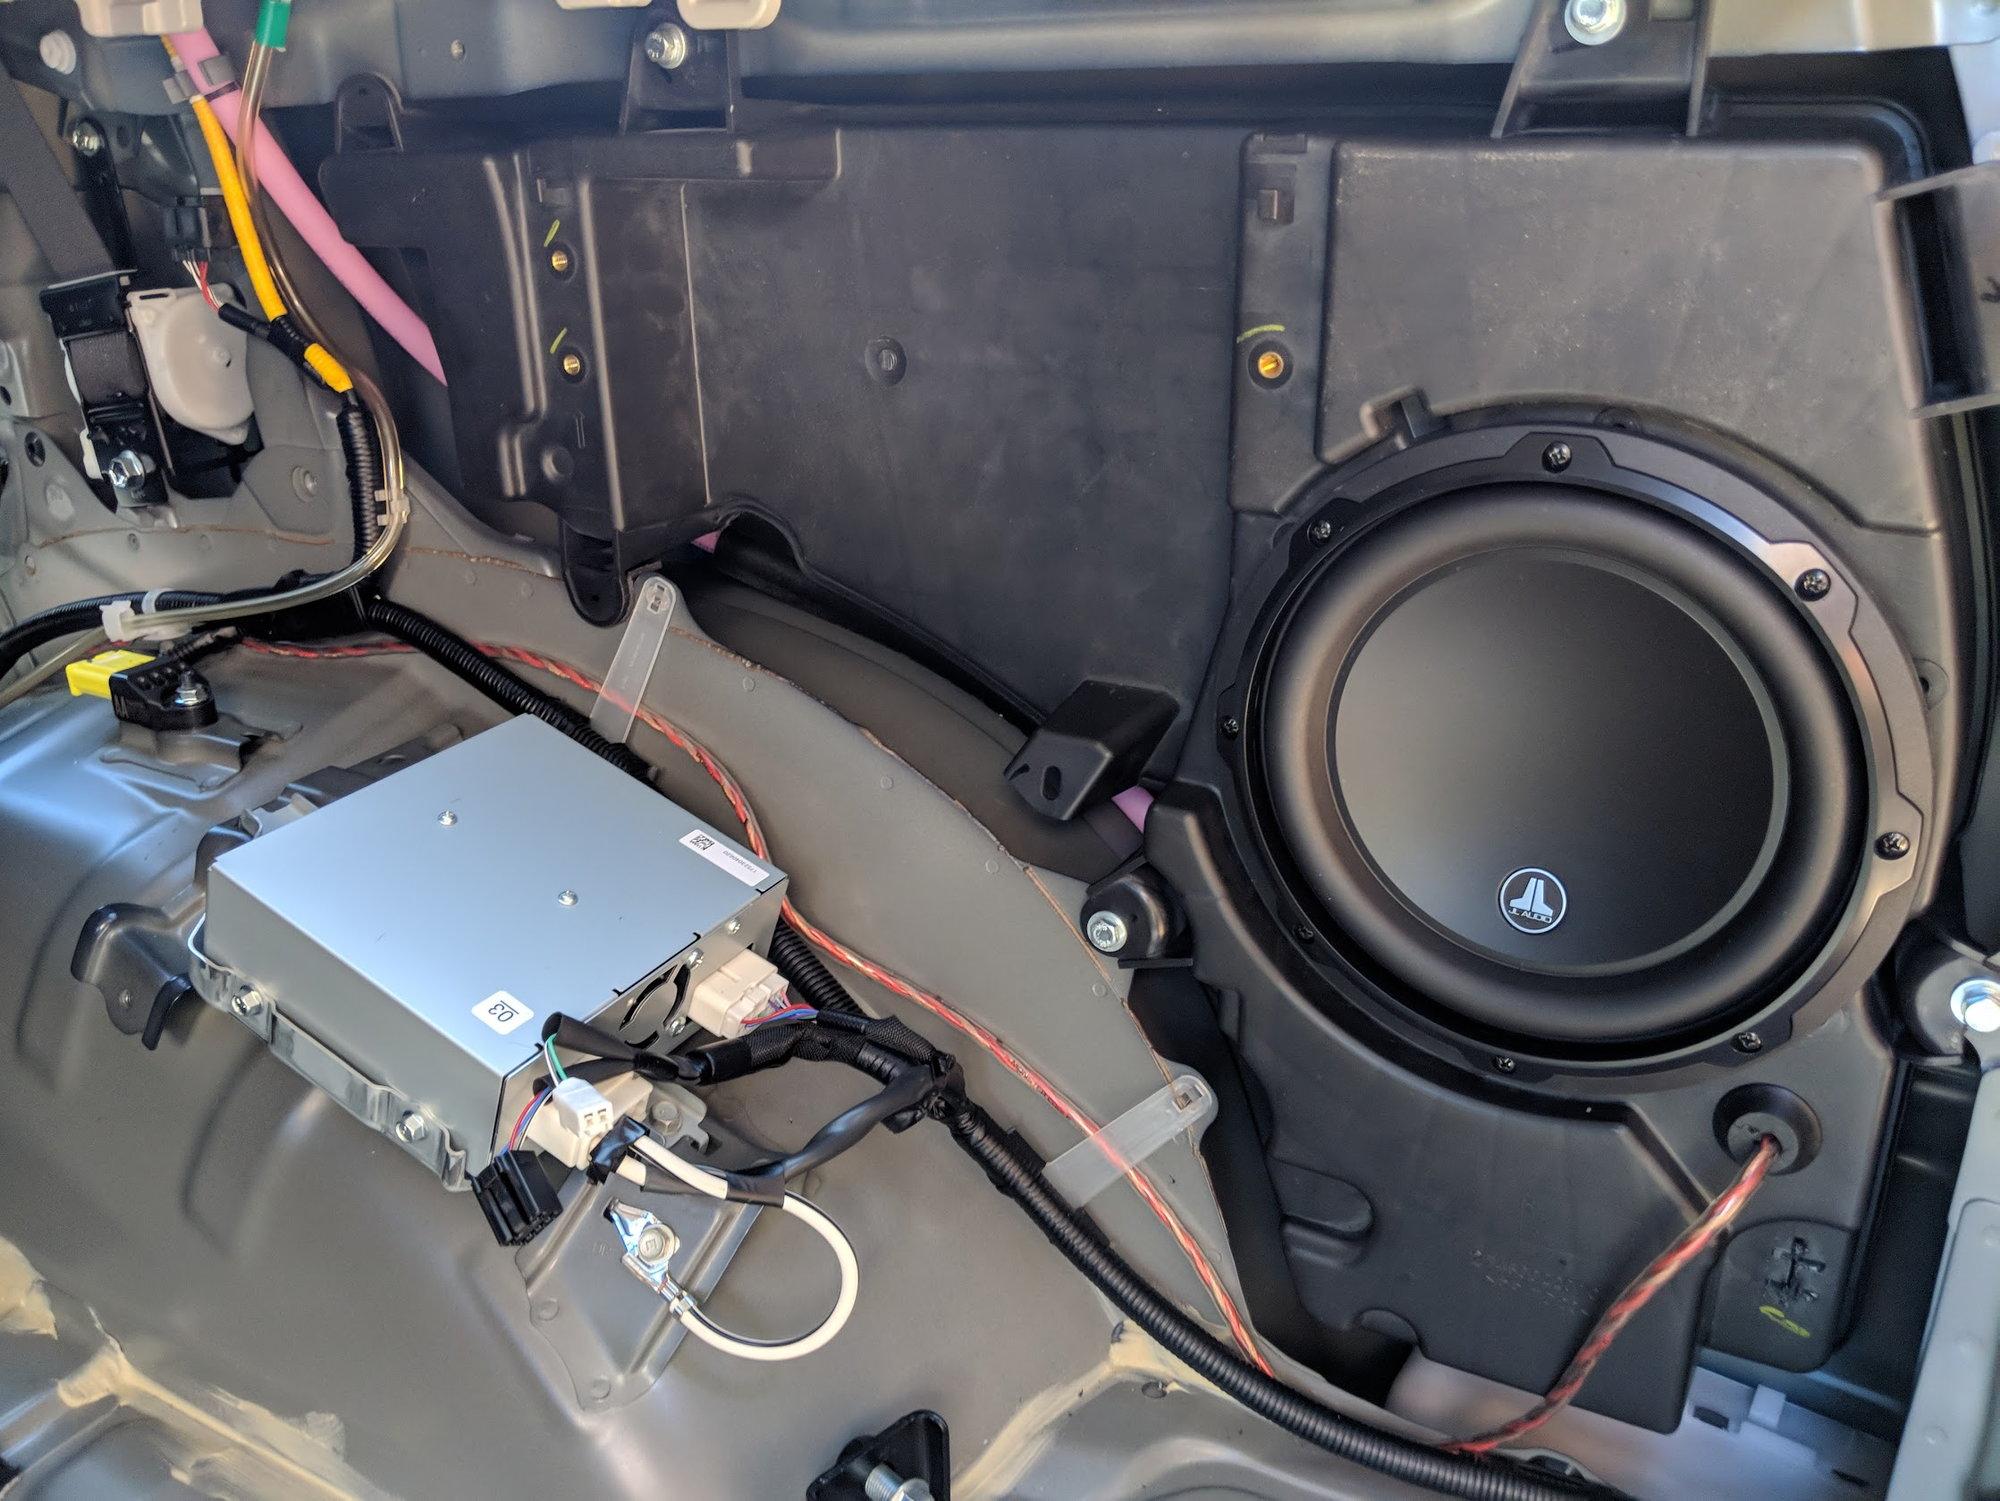 gen 5th 4runner row enclosure third subwoofer sub toyota rear install seat jbl pocket removal remove panel location sr5 had